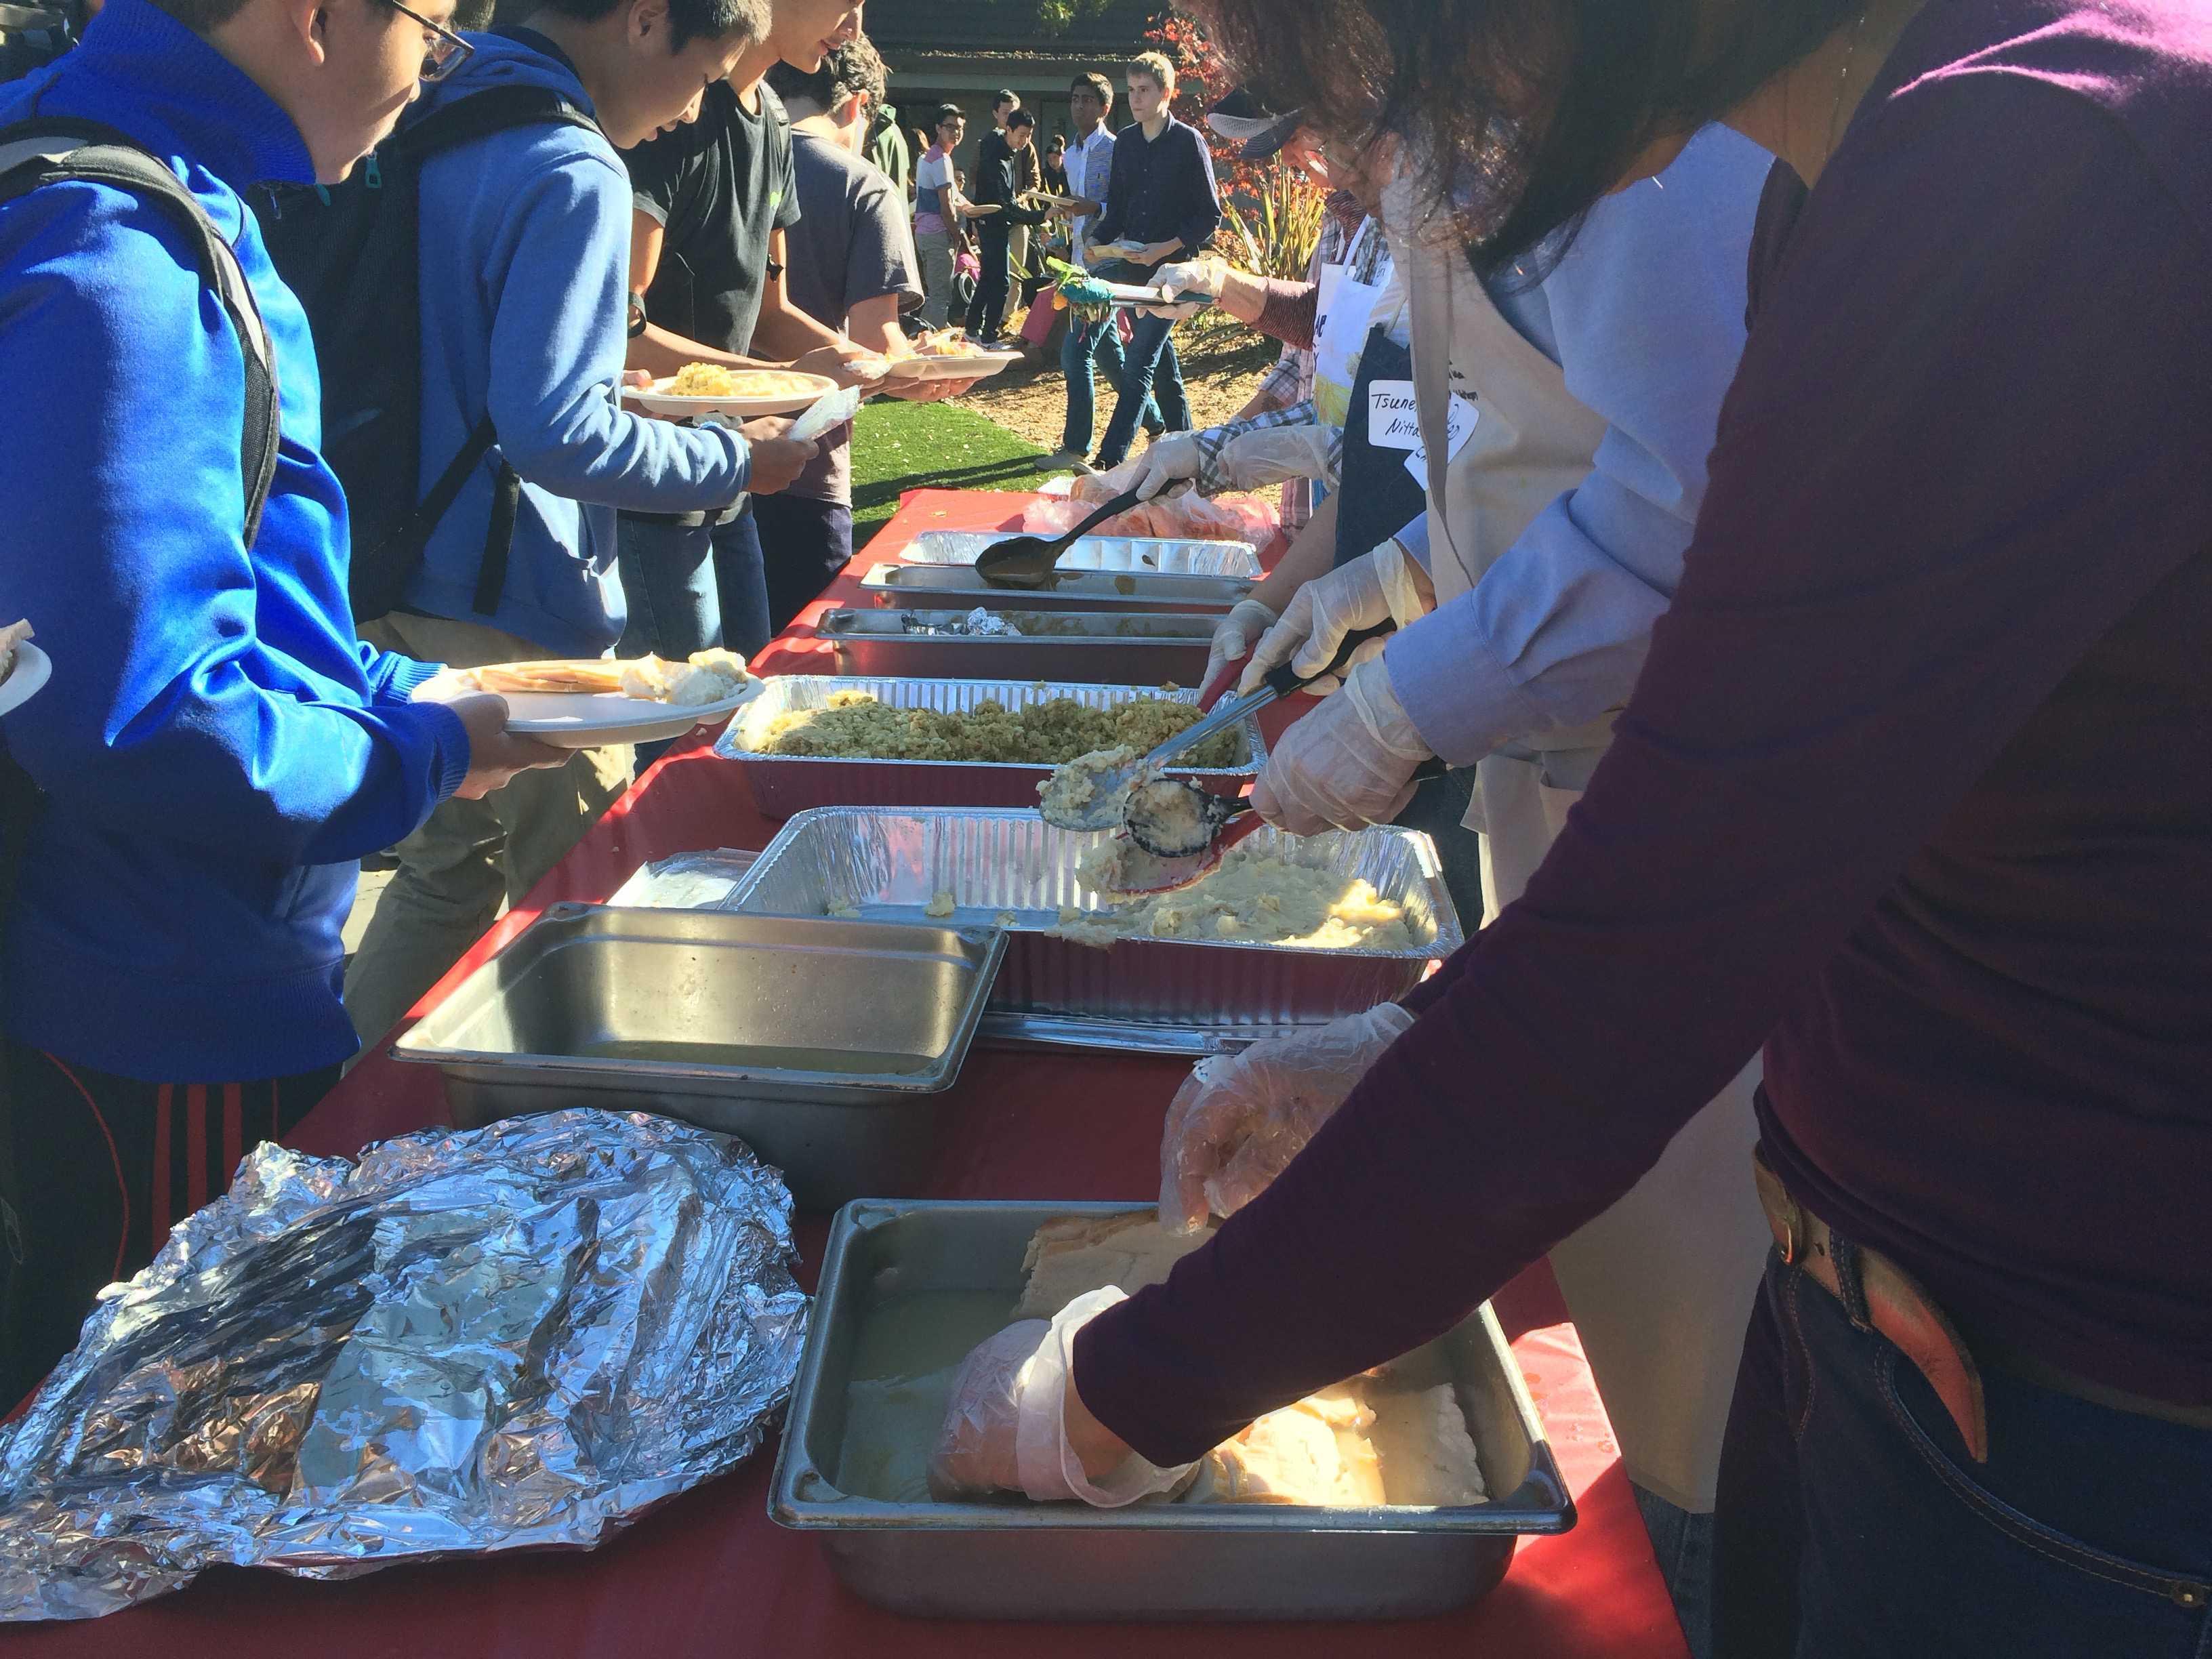 Snapshots: School gathers for annual Turkey Feast